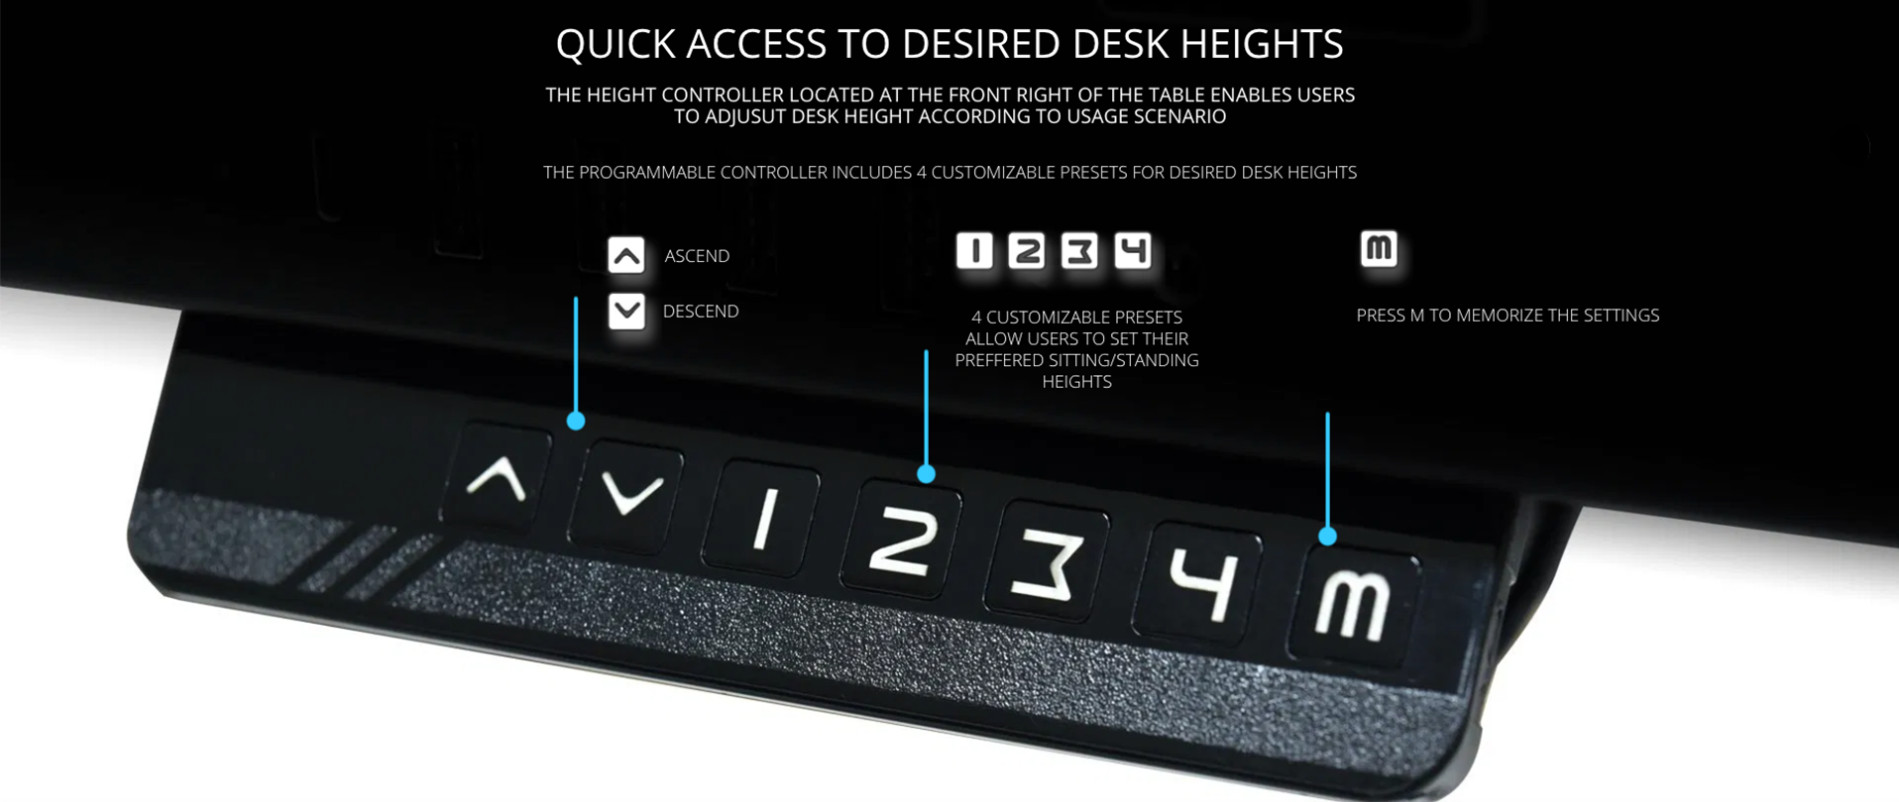 Bàn Gaming Desk Lian-Li DK-04FX giới thiệu 2